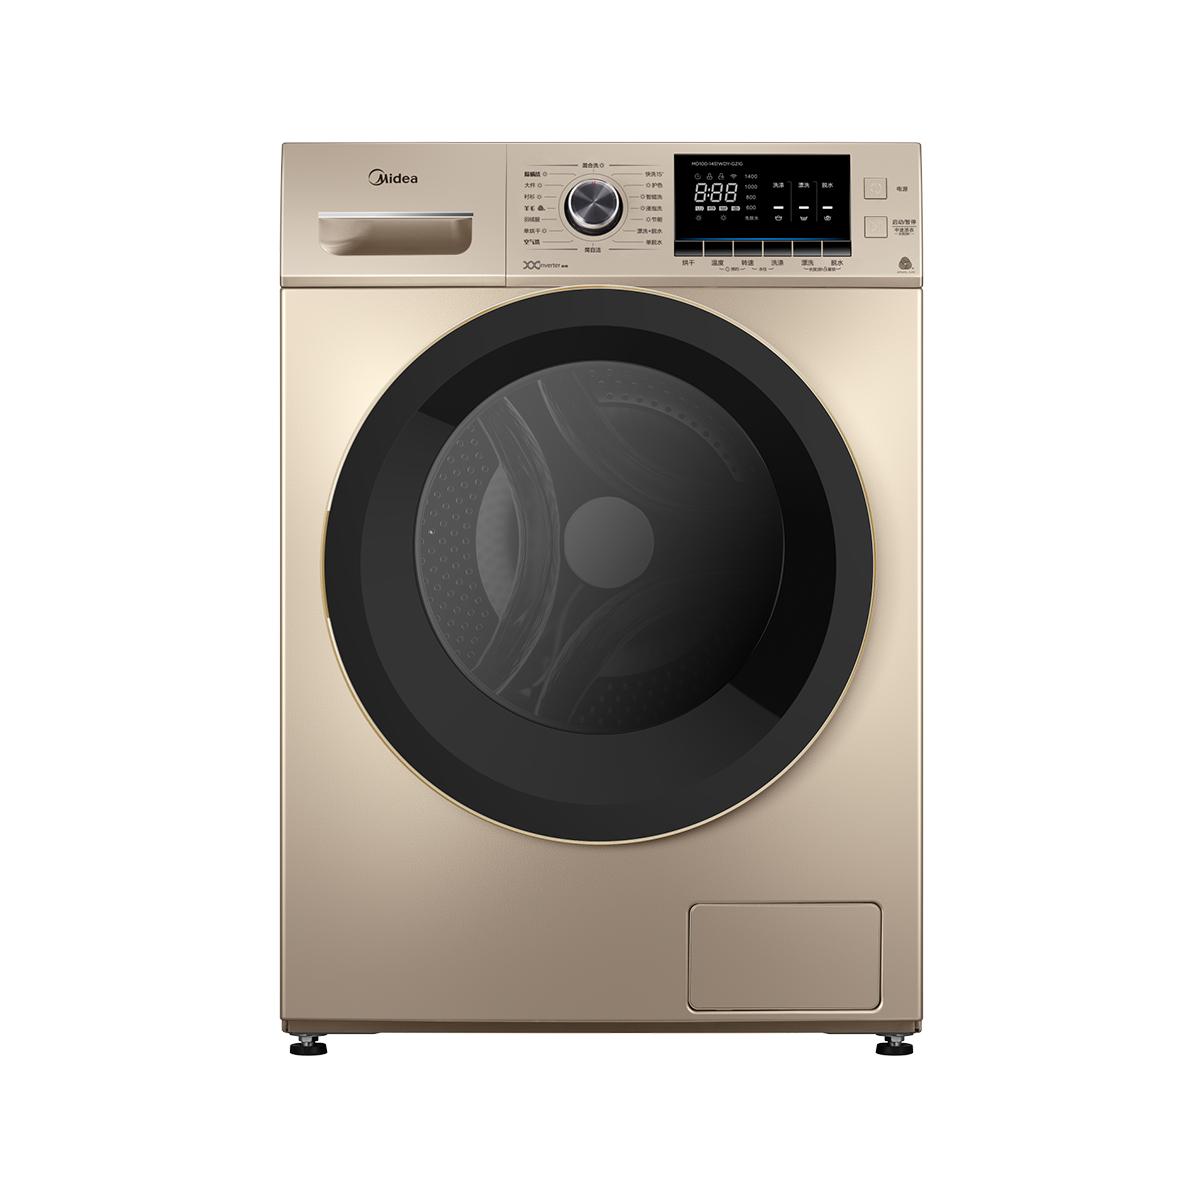 Midea/美的 MD100-1451WDY-G21G洗衣机 说明书.pdf